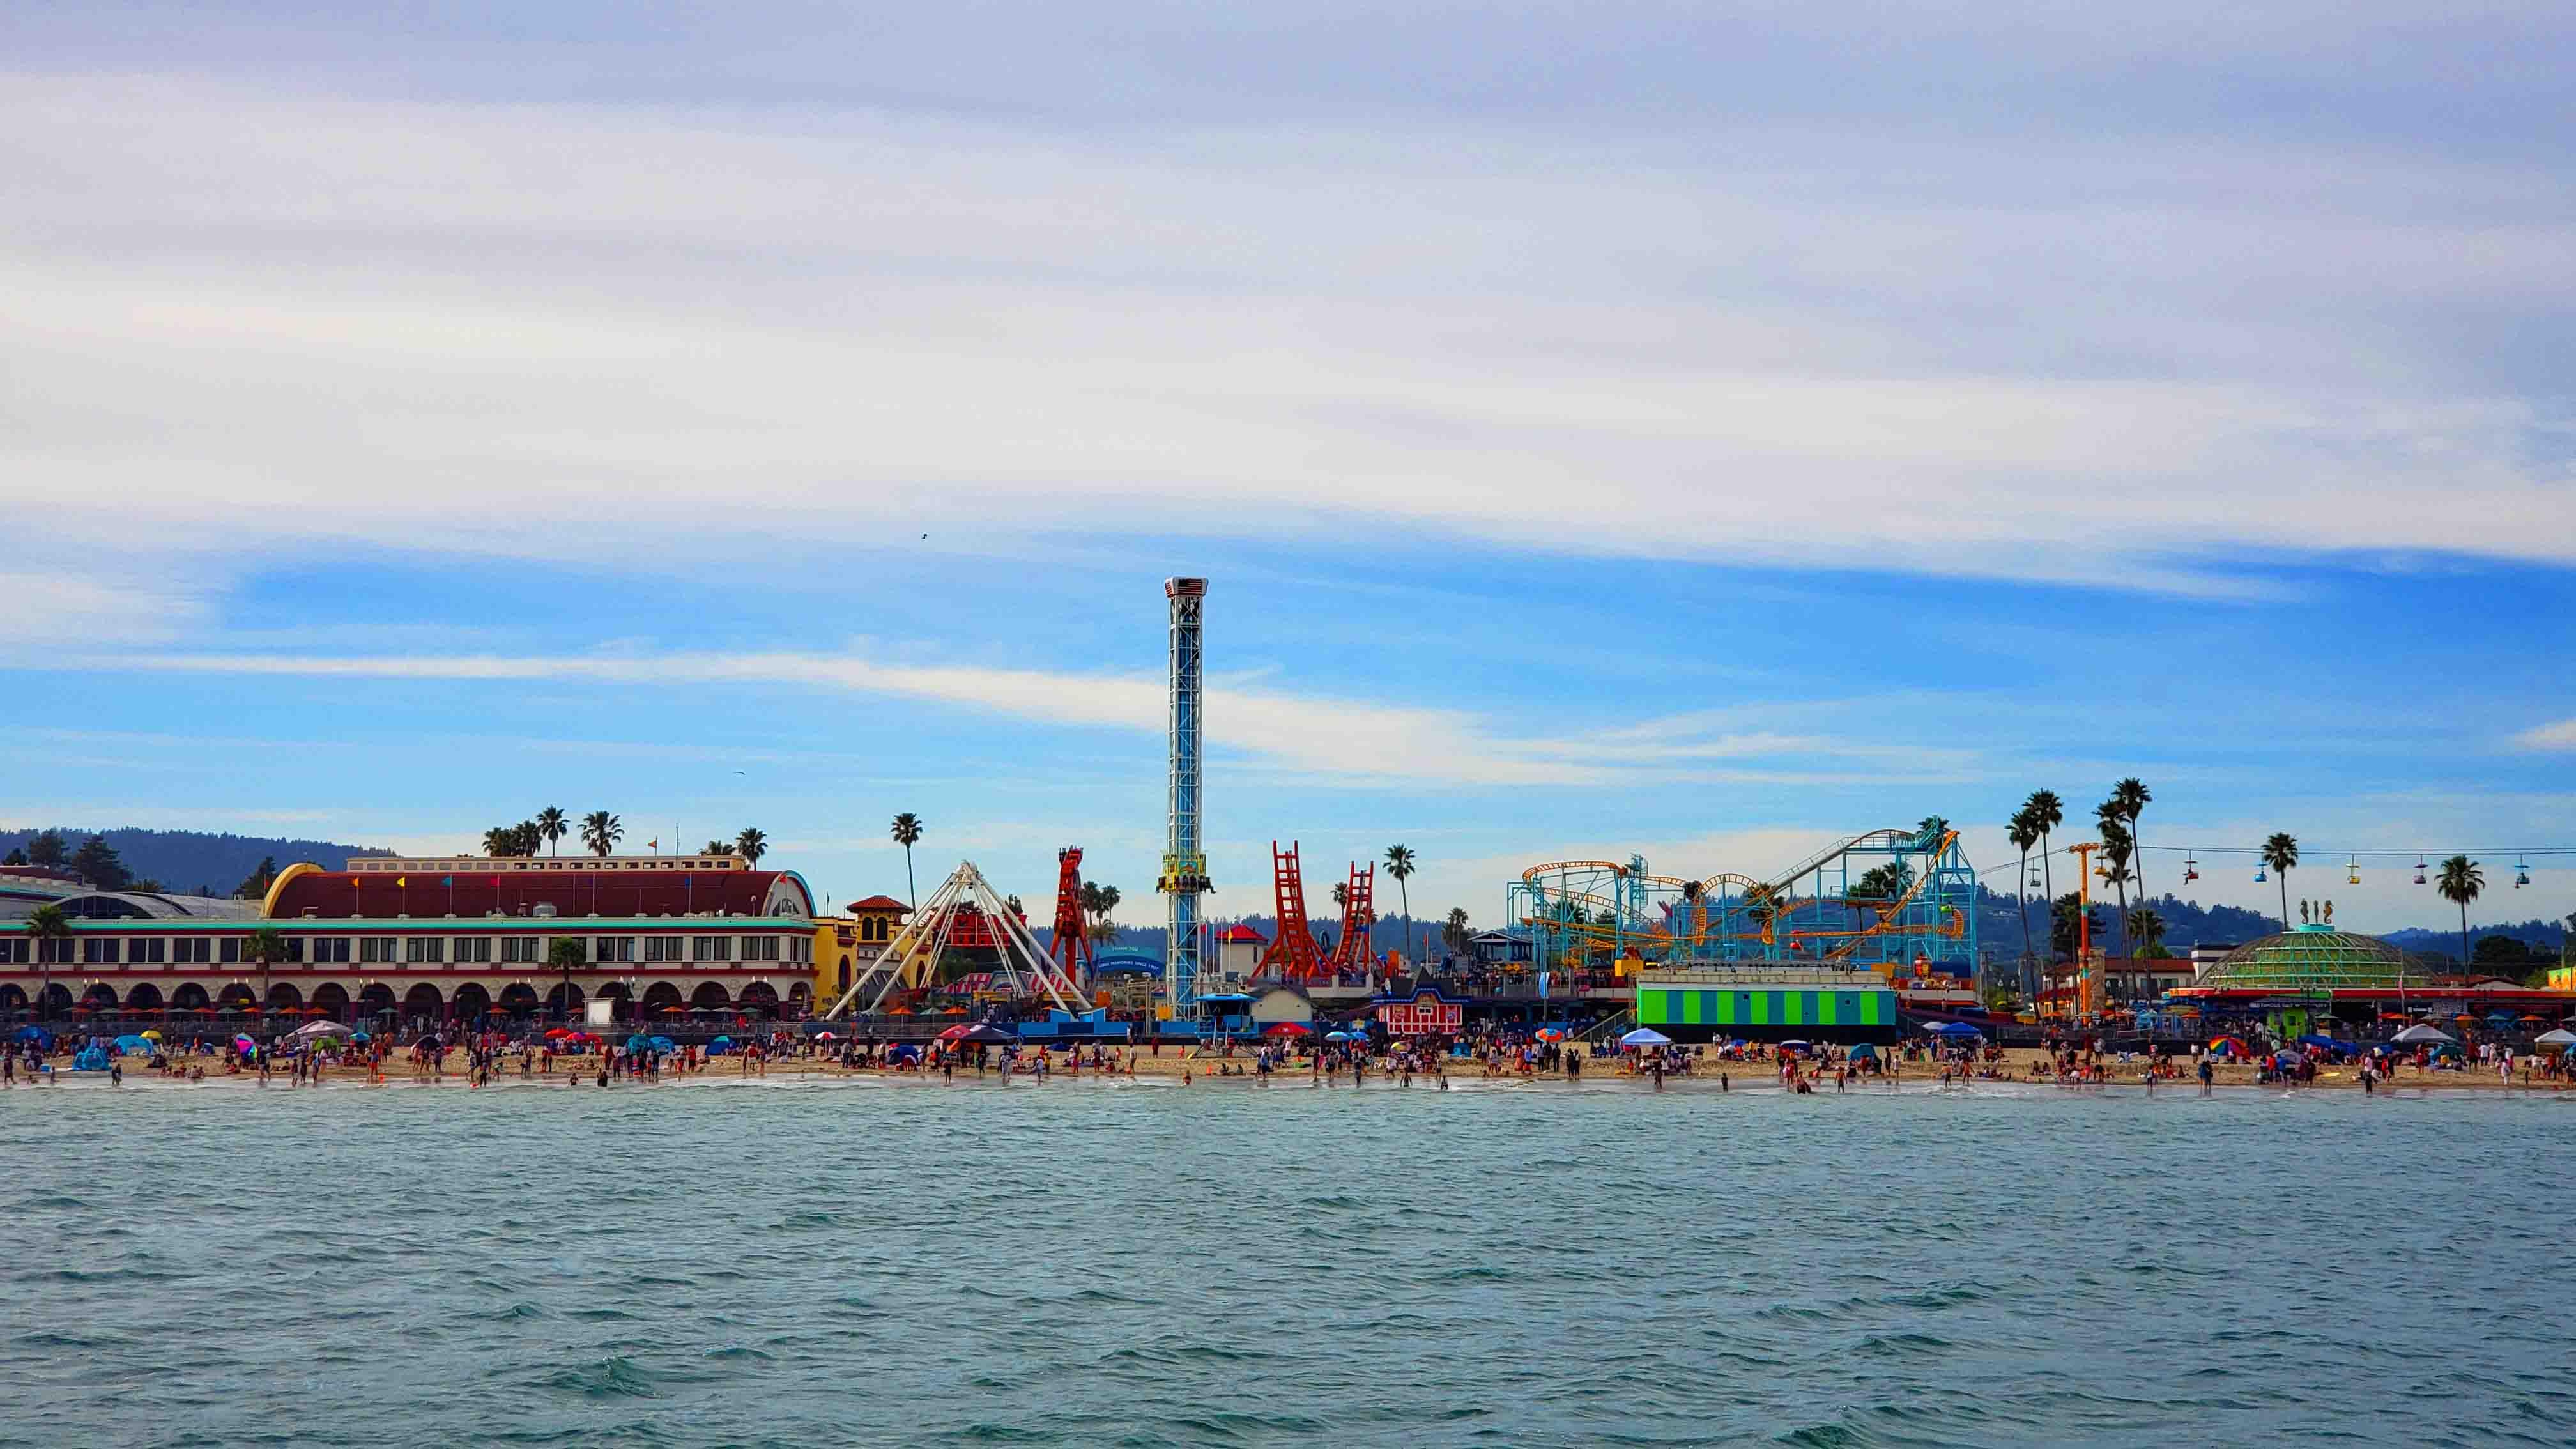 Boardwalk em Santa Cruz